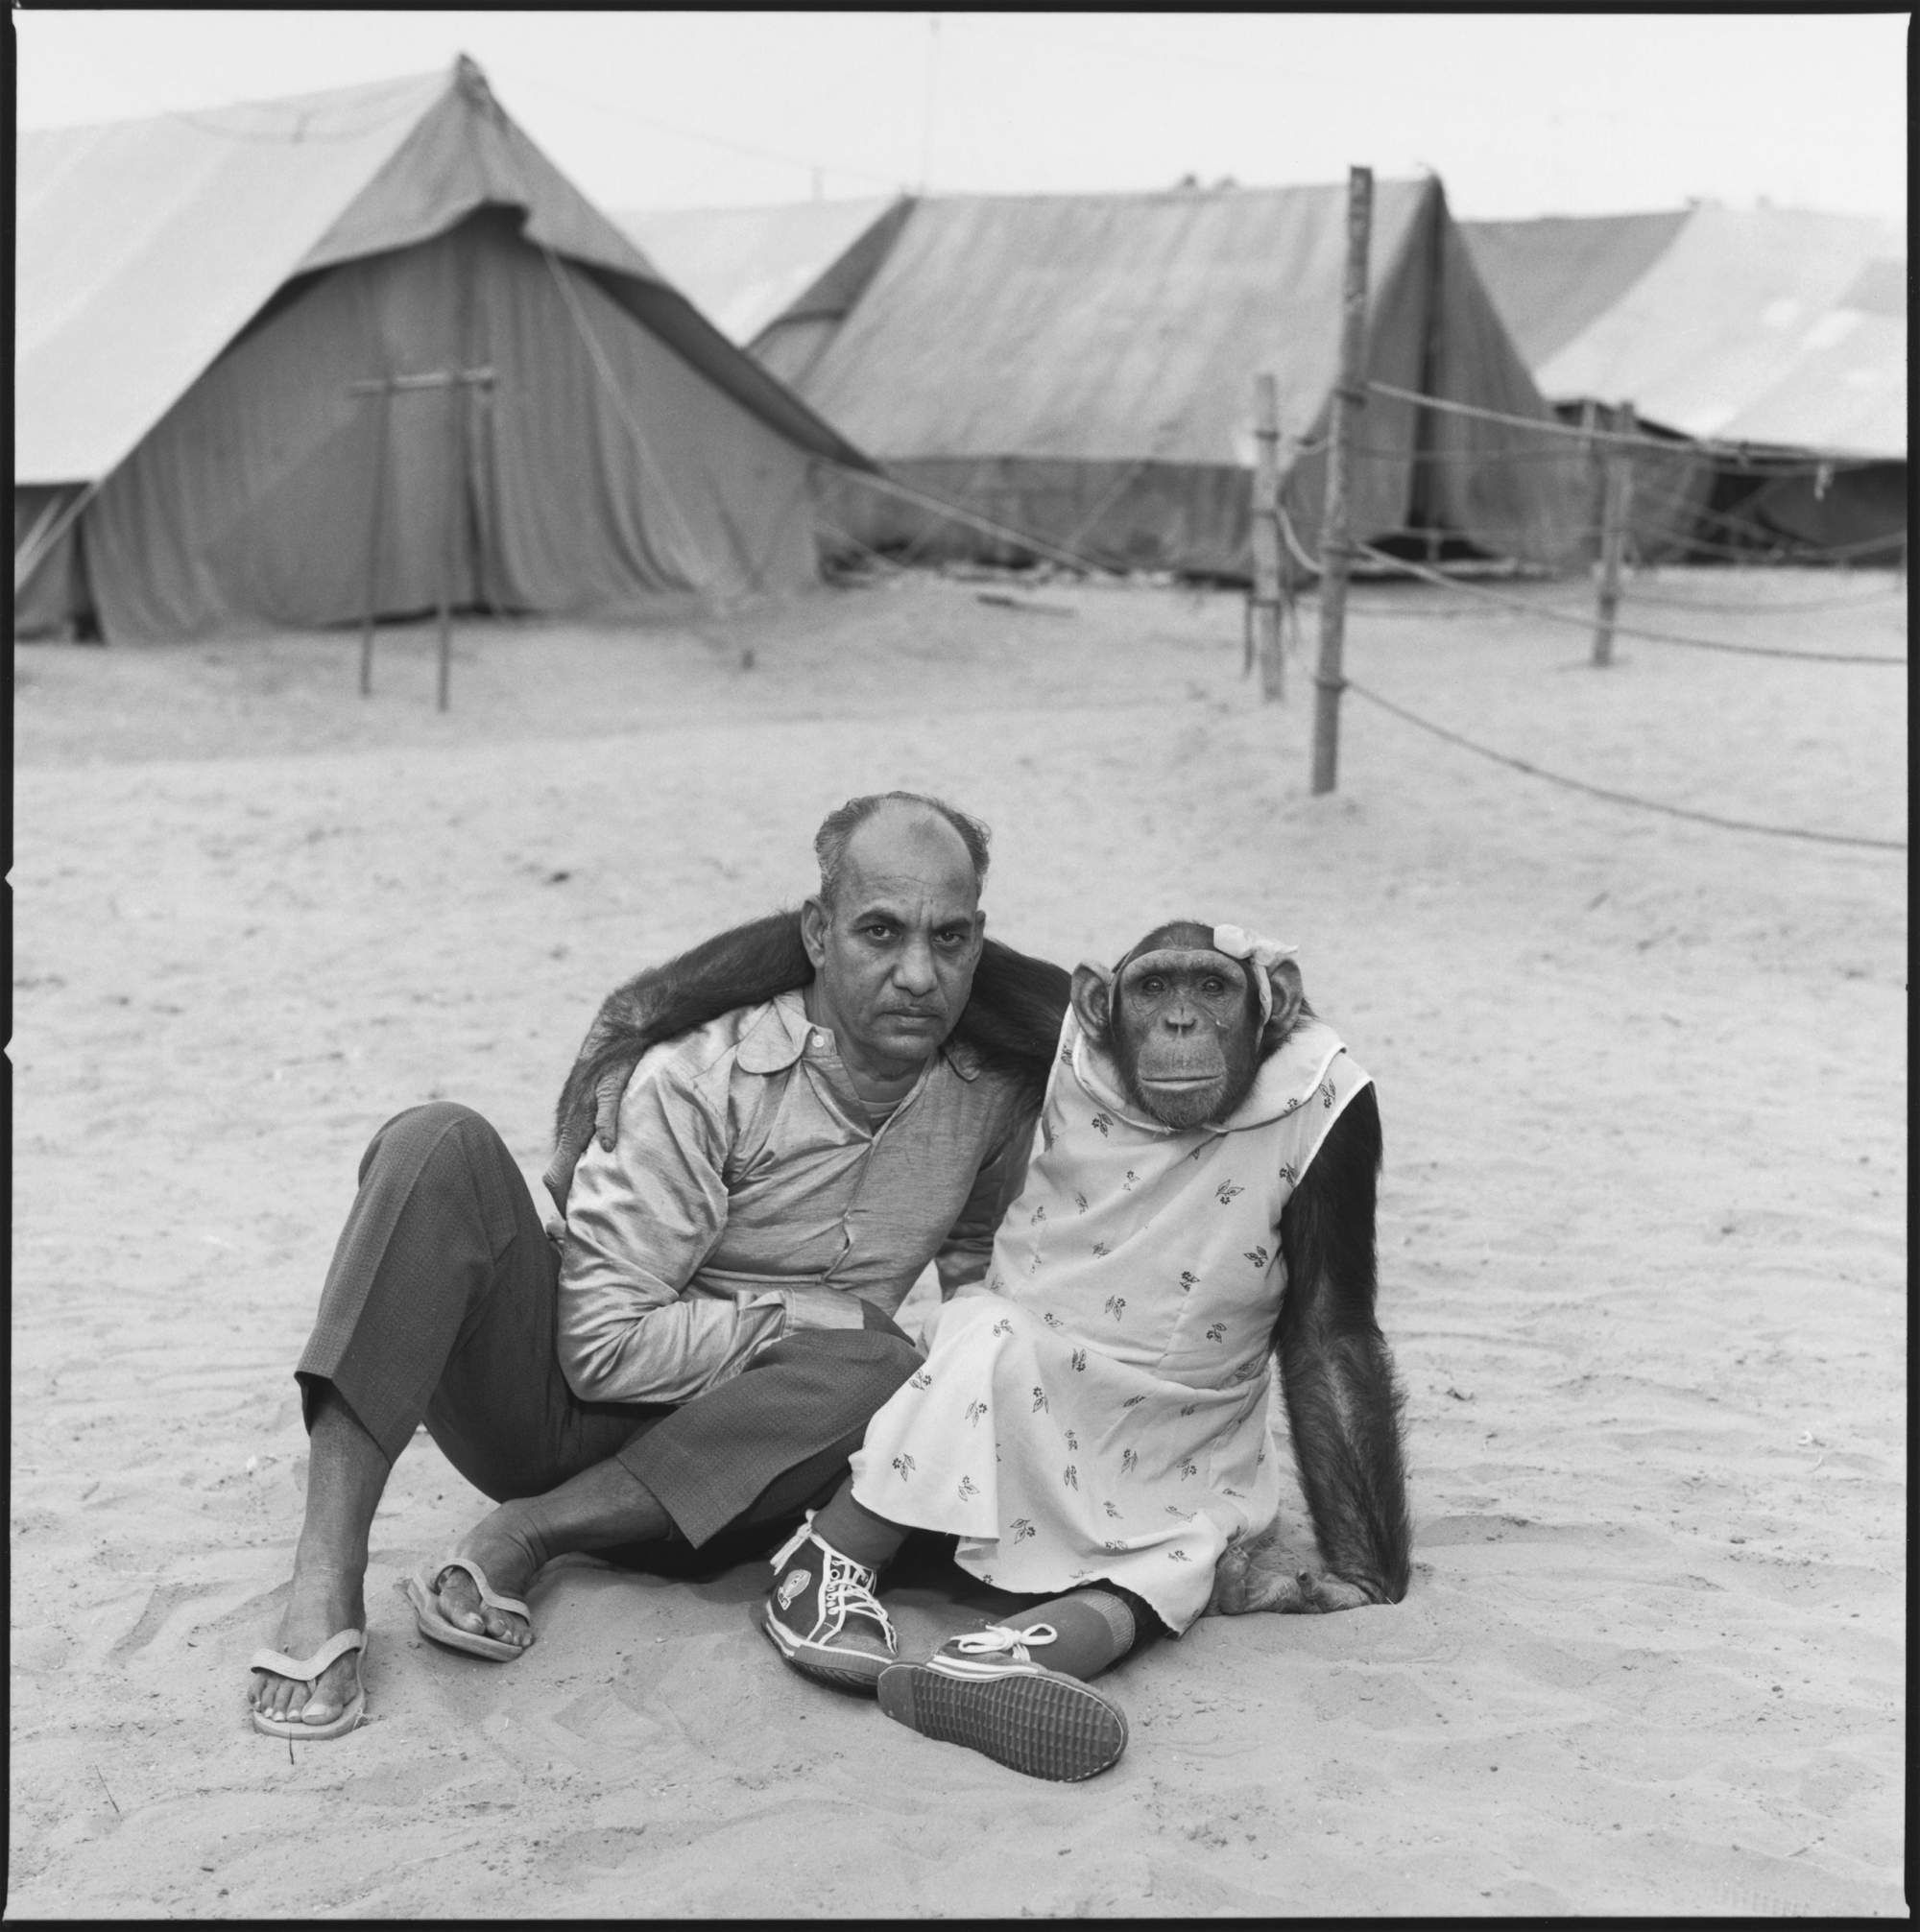 Arjun with his chimpanzee Mira, Great Royal Circus. Gujarat, India, 1989. Mary Ellen Mark